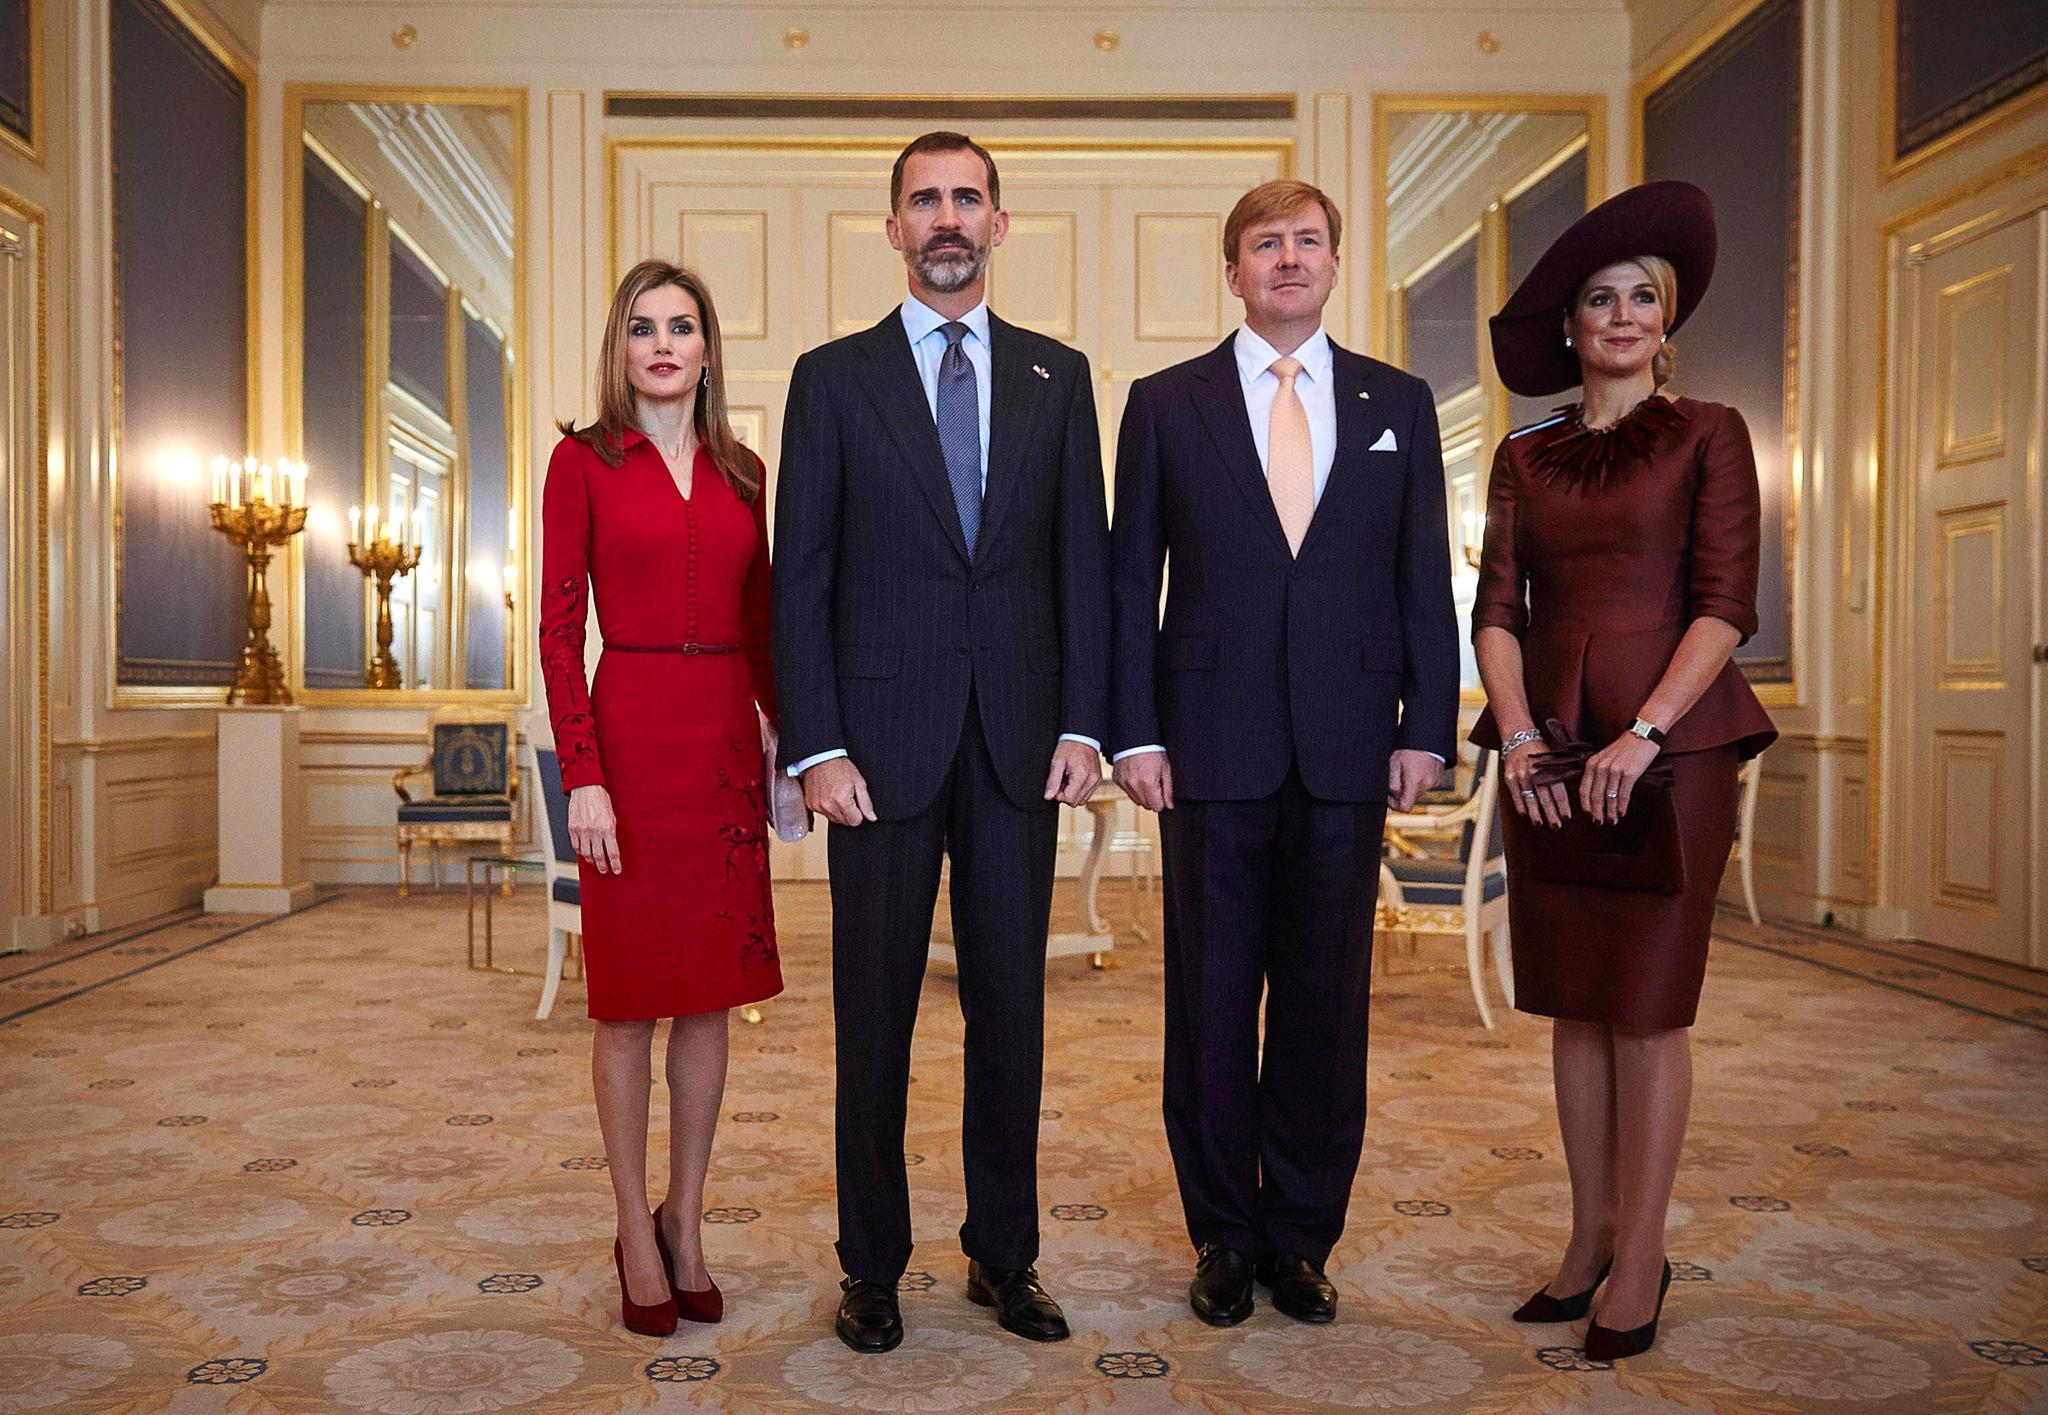 Königin Letizia, König Felipe, König Willem-Alexander, Königin Maxima